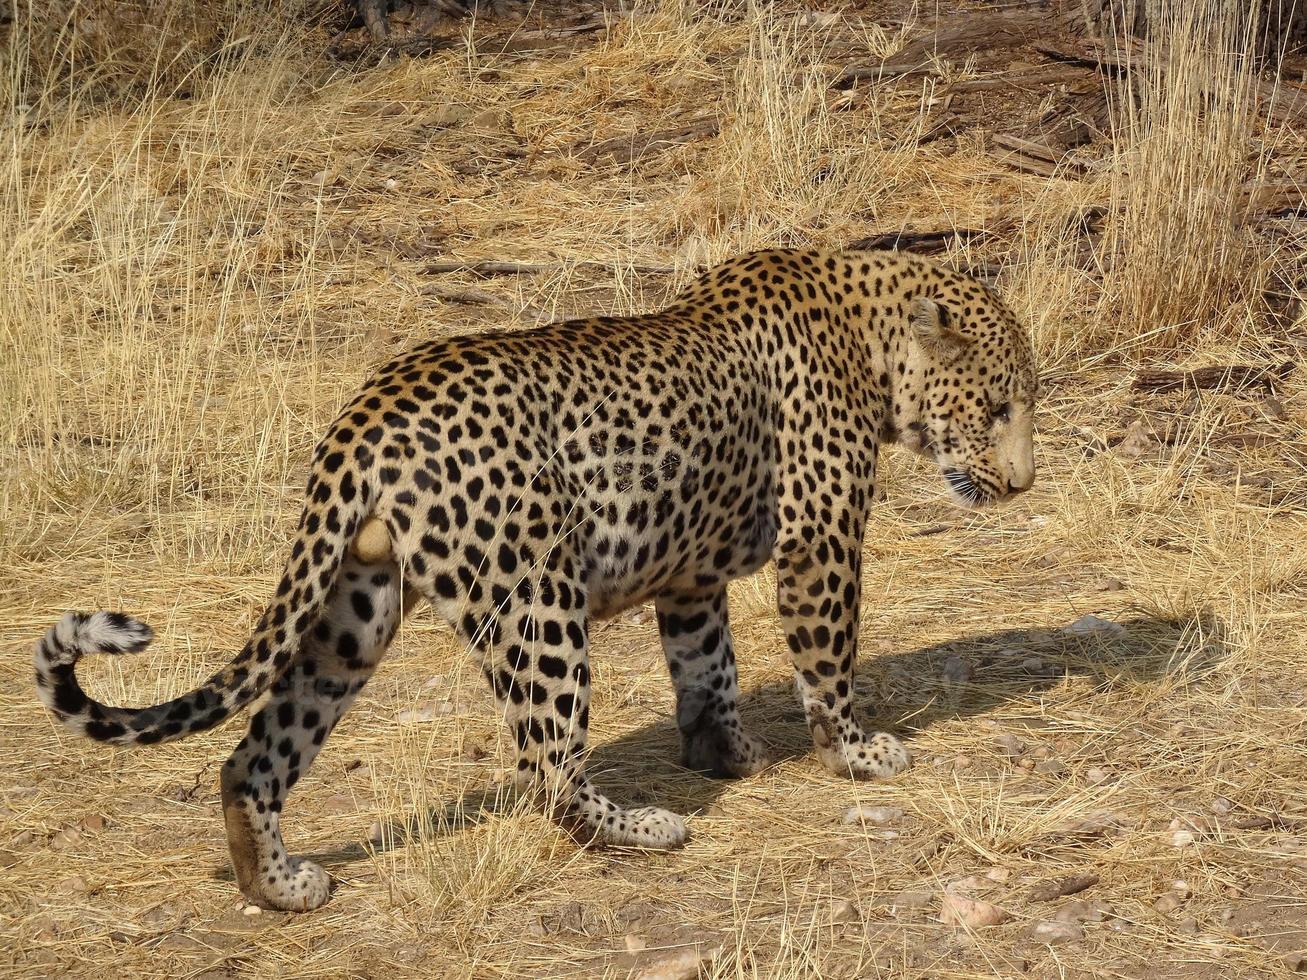 maravilhoso leopardo andando foto